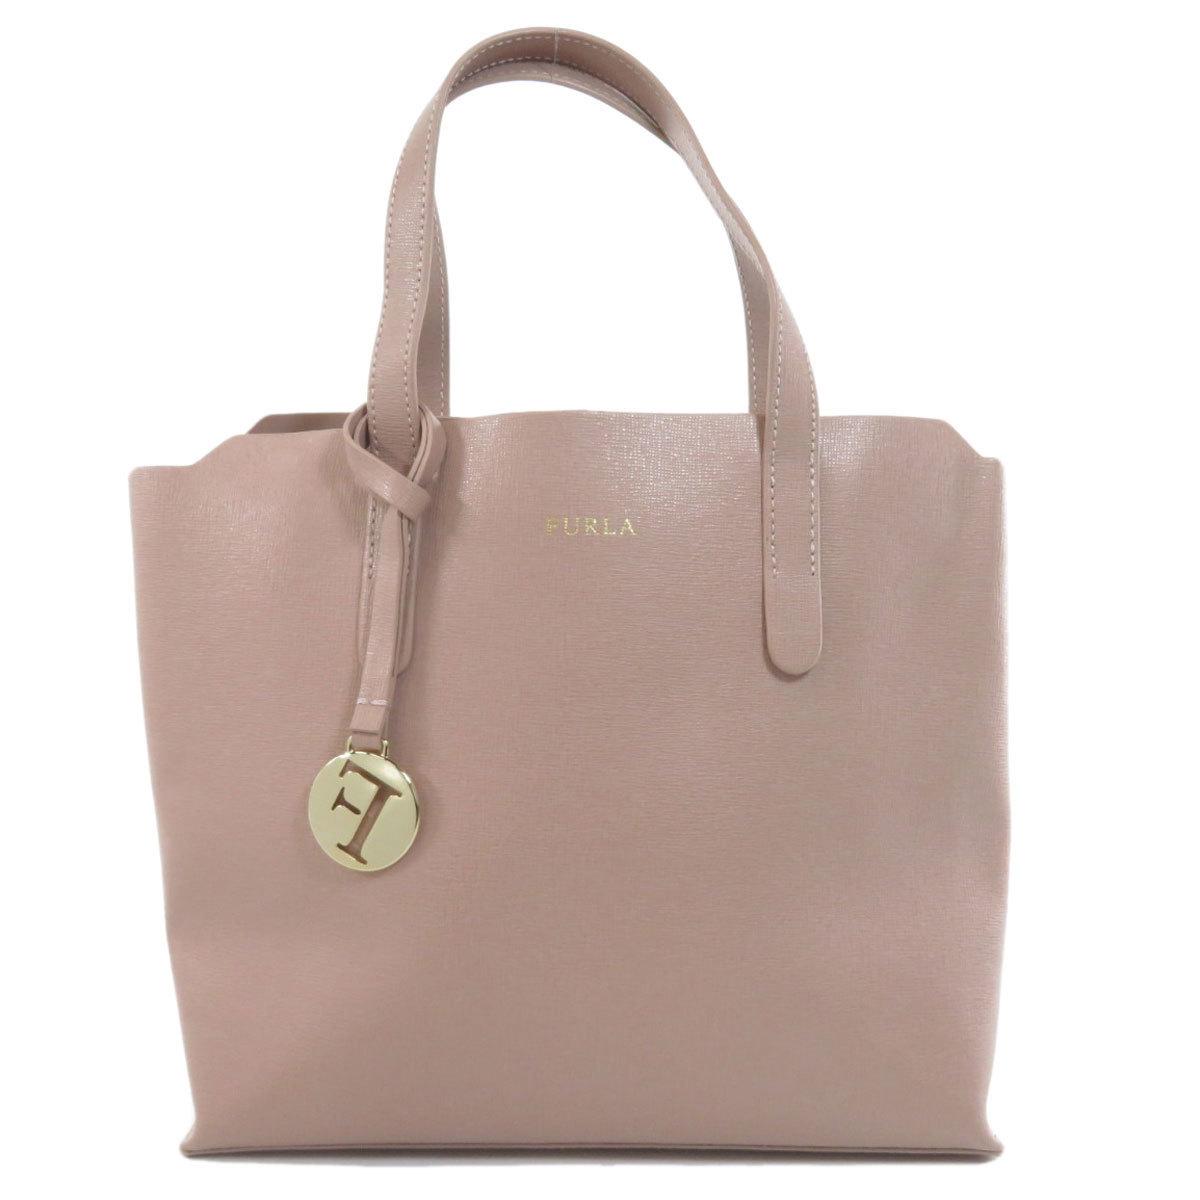 Furla logo handbag leather ladies